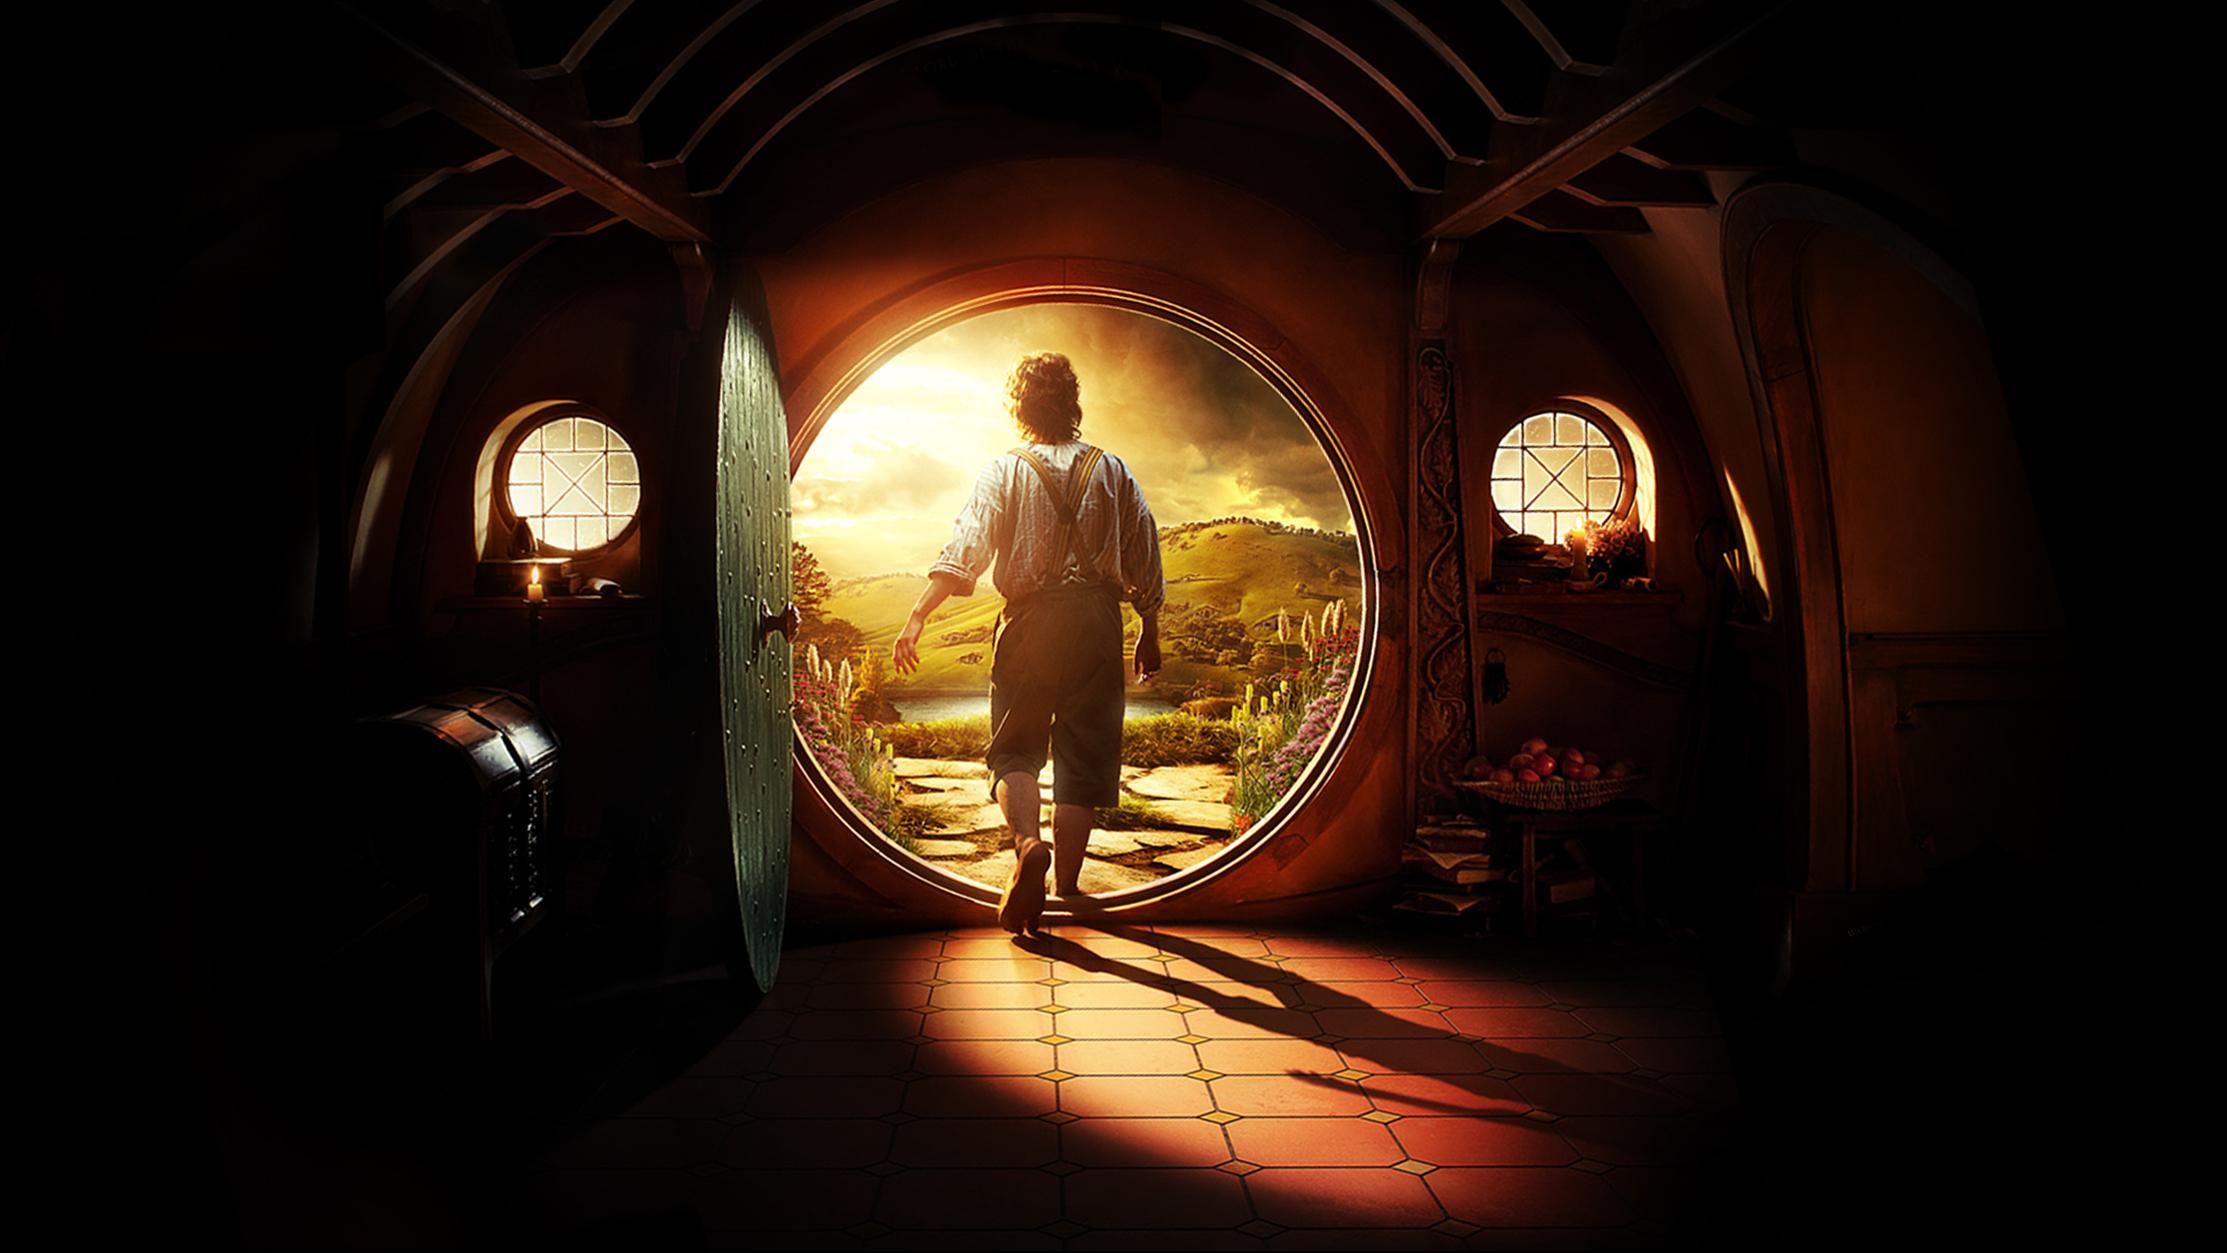 The Hobbit The Hobbit   Bilbo Baggins Wallpaper 2227x1253